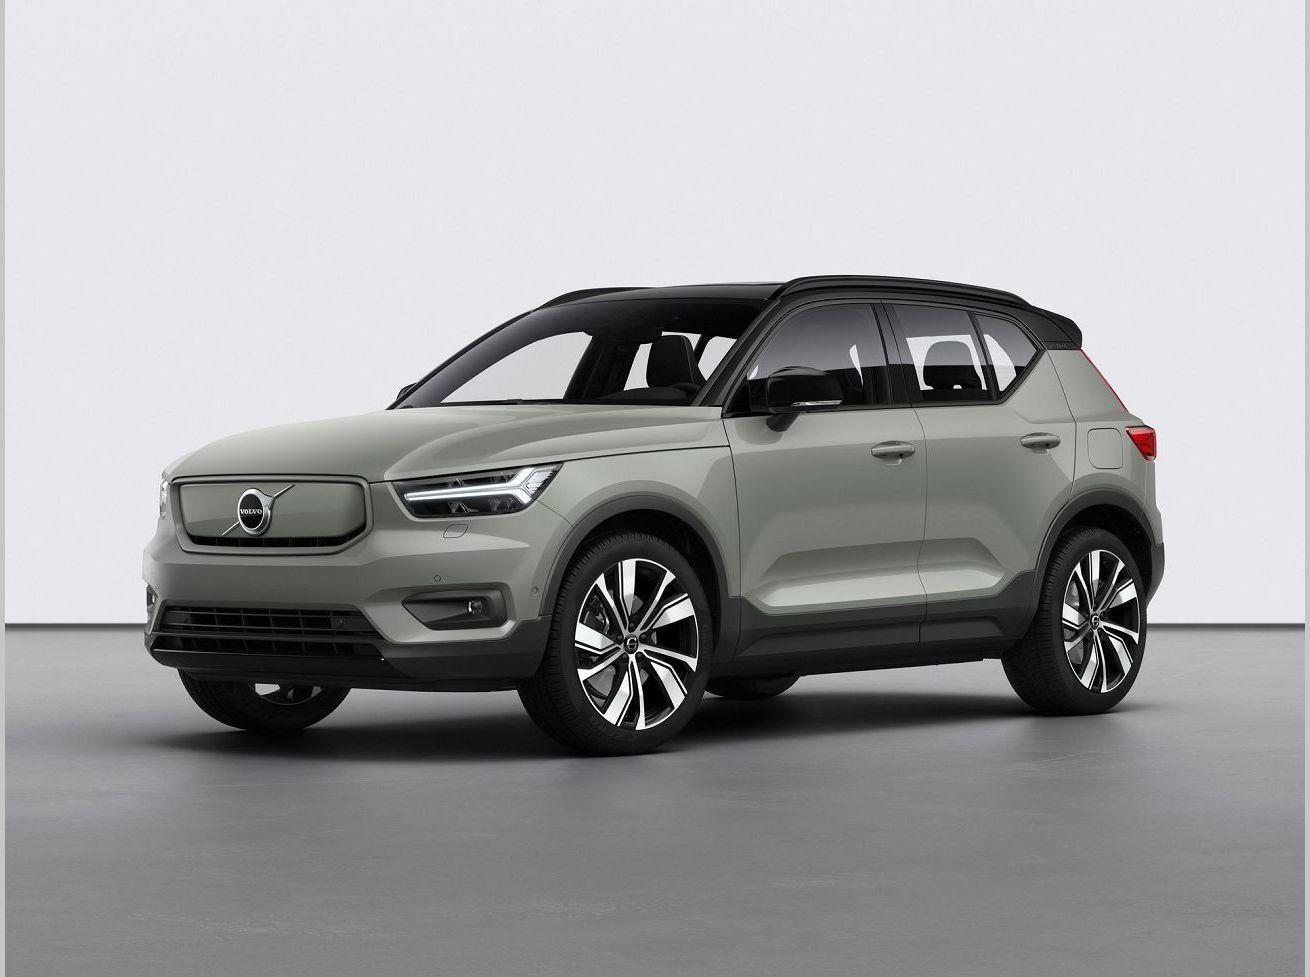 2022 Volvo Xc40 Cc 40 Car Price Compact Xe40 Exterior